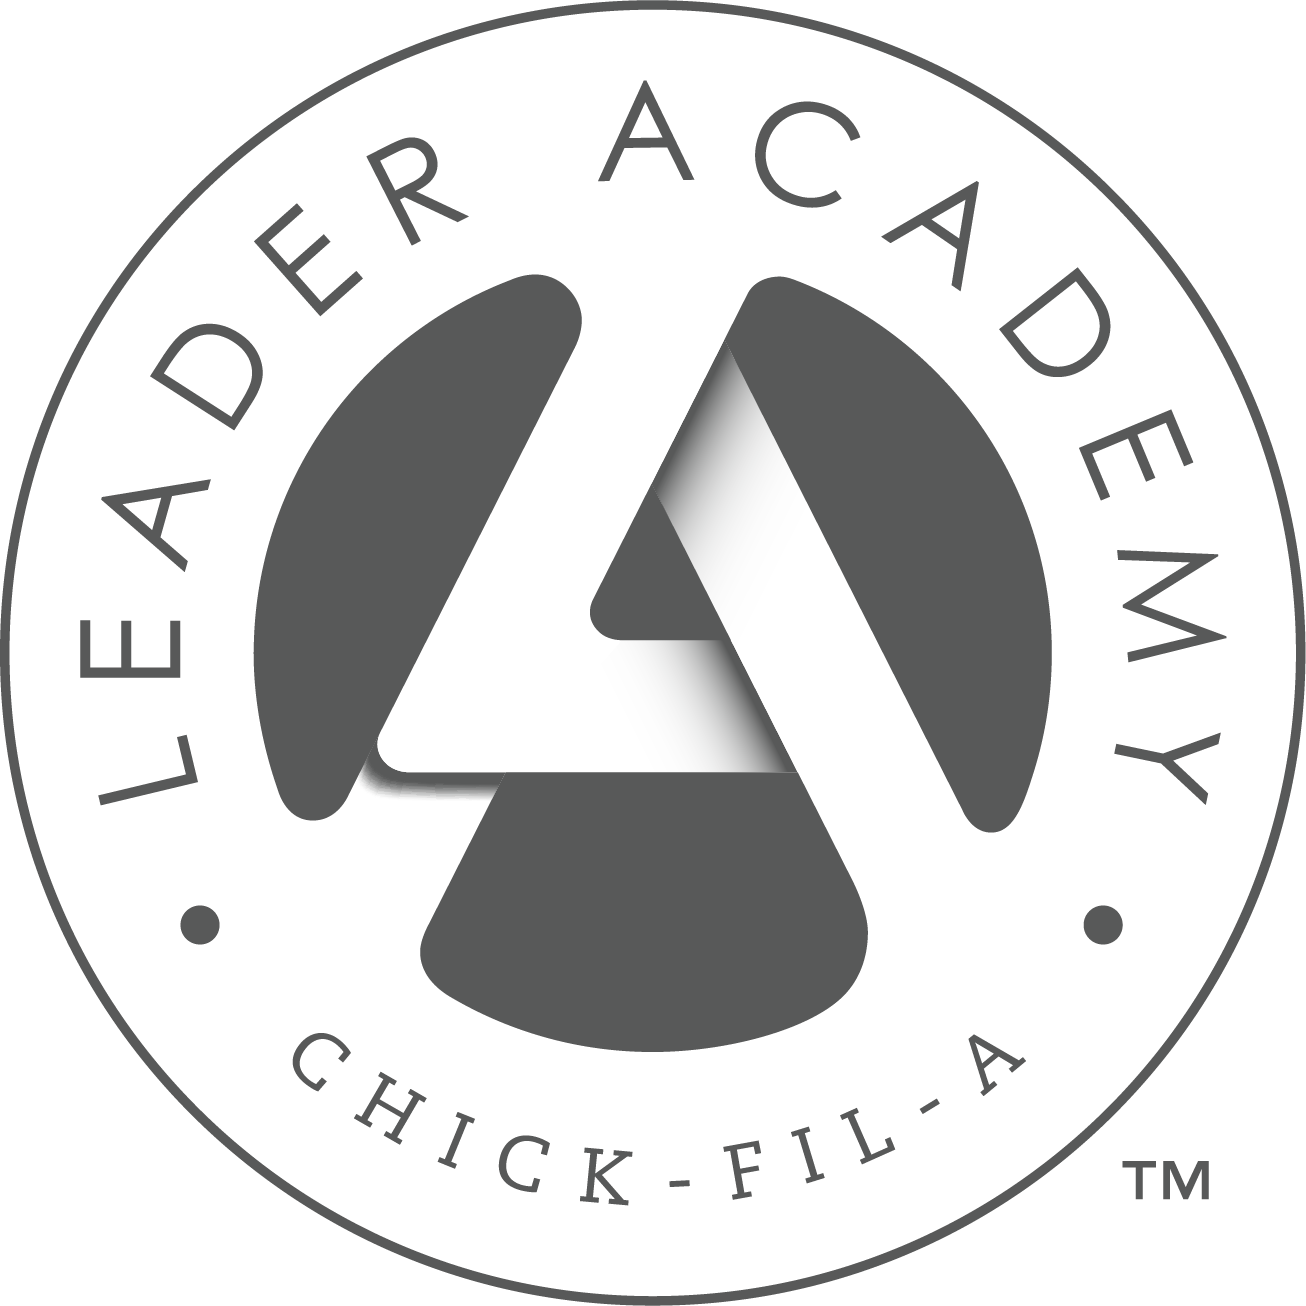 CFA_LeaderAcademy_logo.png